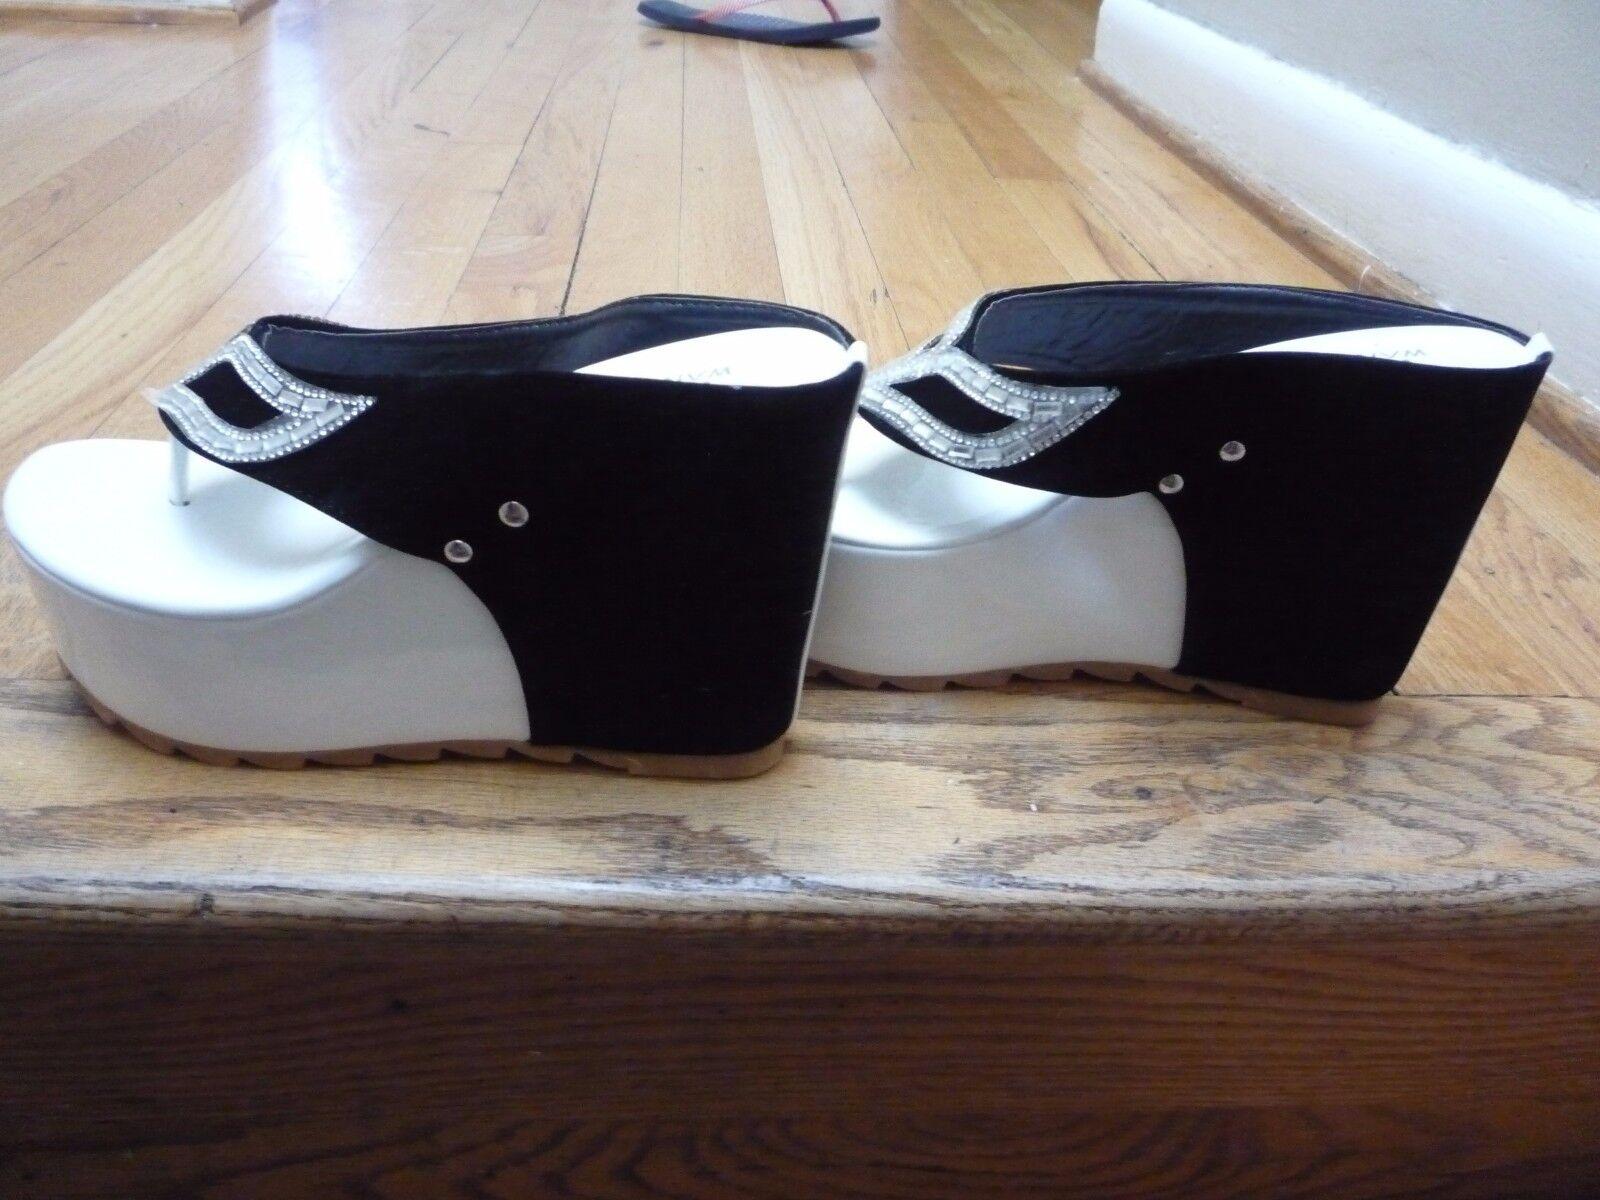 A NEW piar of Ladies Sandal's: NATURILIZER- Rochelle-Navy - 6M Leather